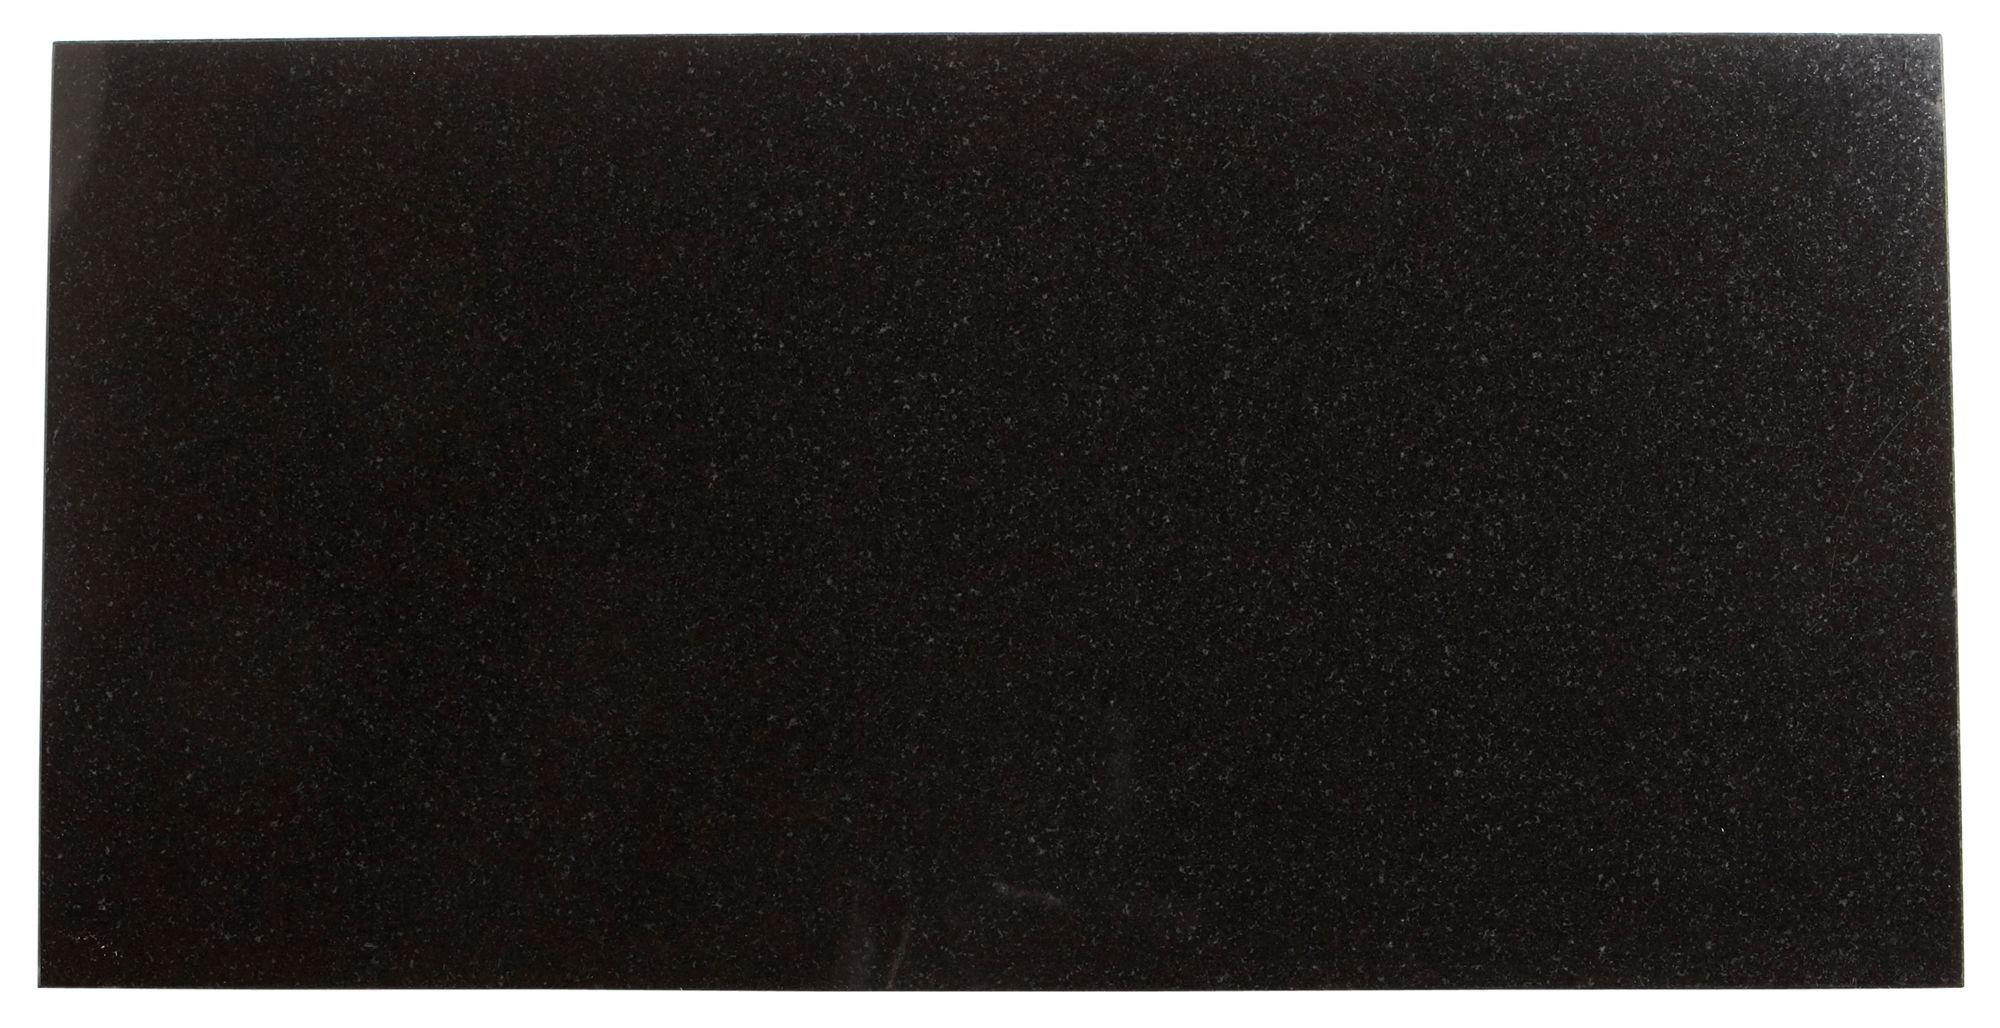 Black Stone Effect Granite Wall & Floor Tile, Pack Of 5, (l)610mm (w)305mm